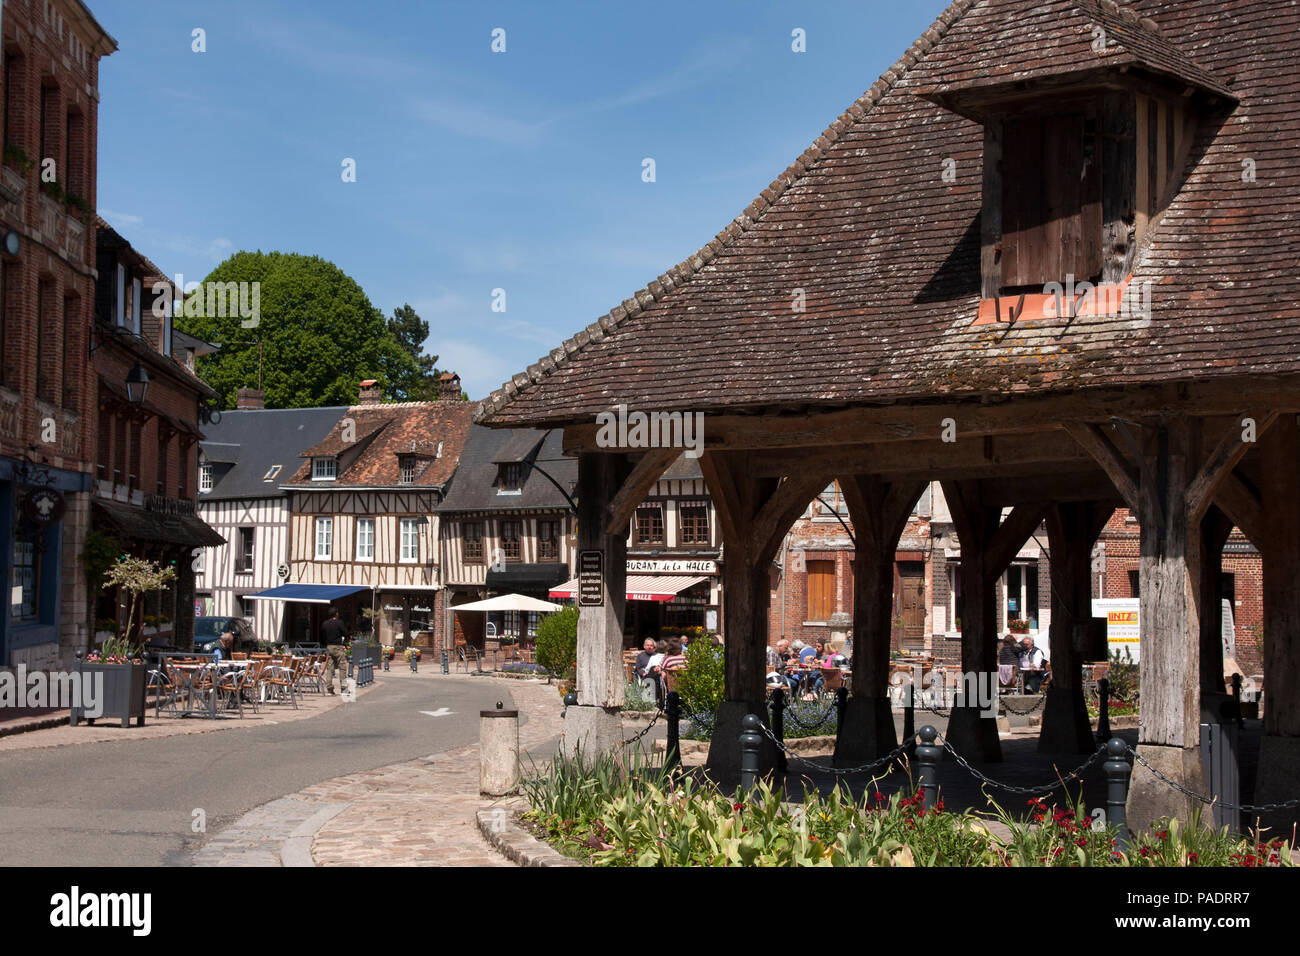 Lyons-la-Forêt & the medieval market place, Eure, Seine Maritime, Haute Normandie, Normandy, north-western France. - Stock Image